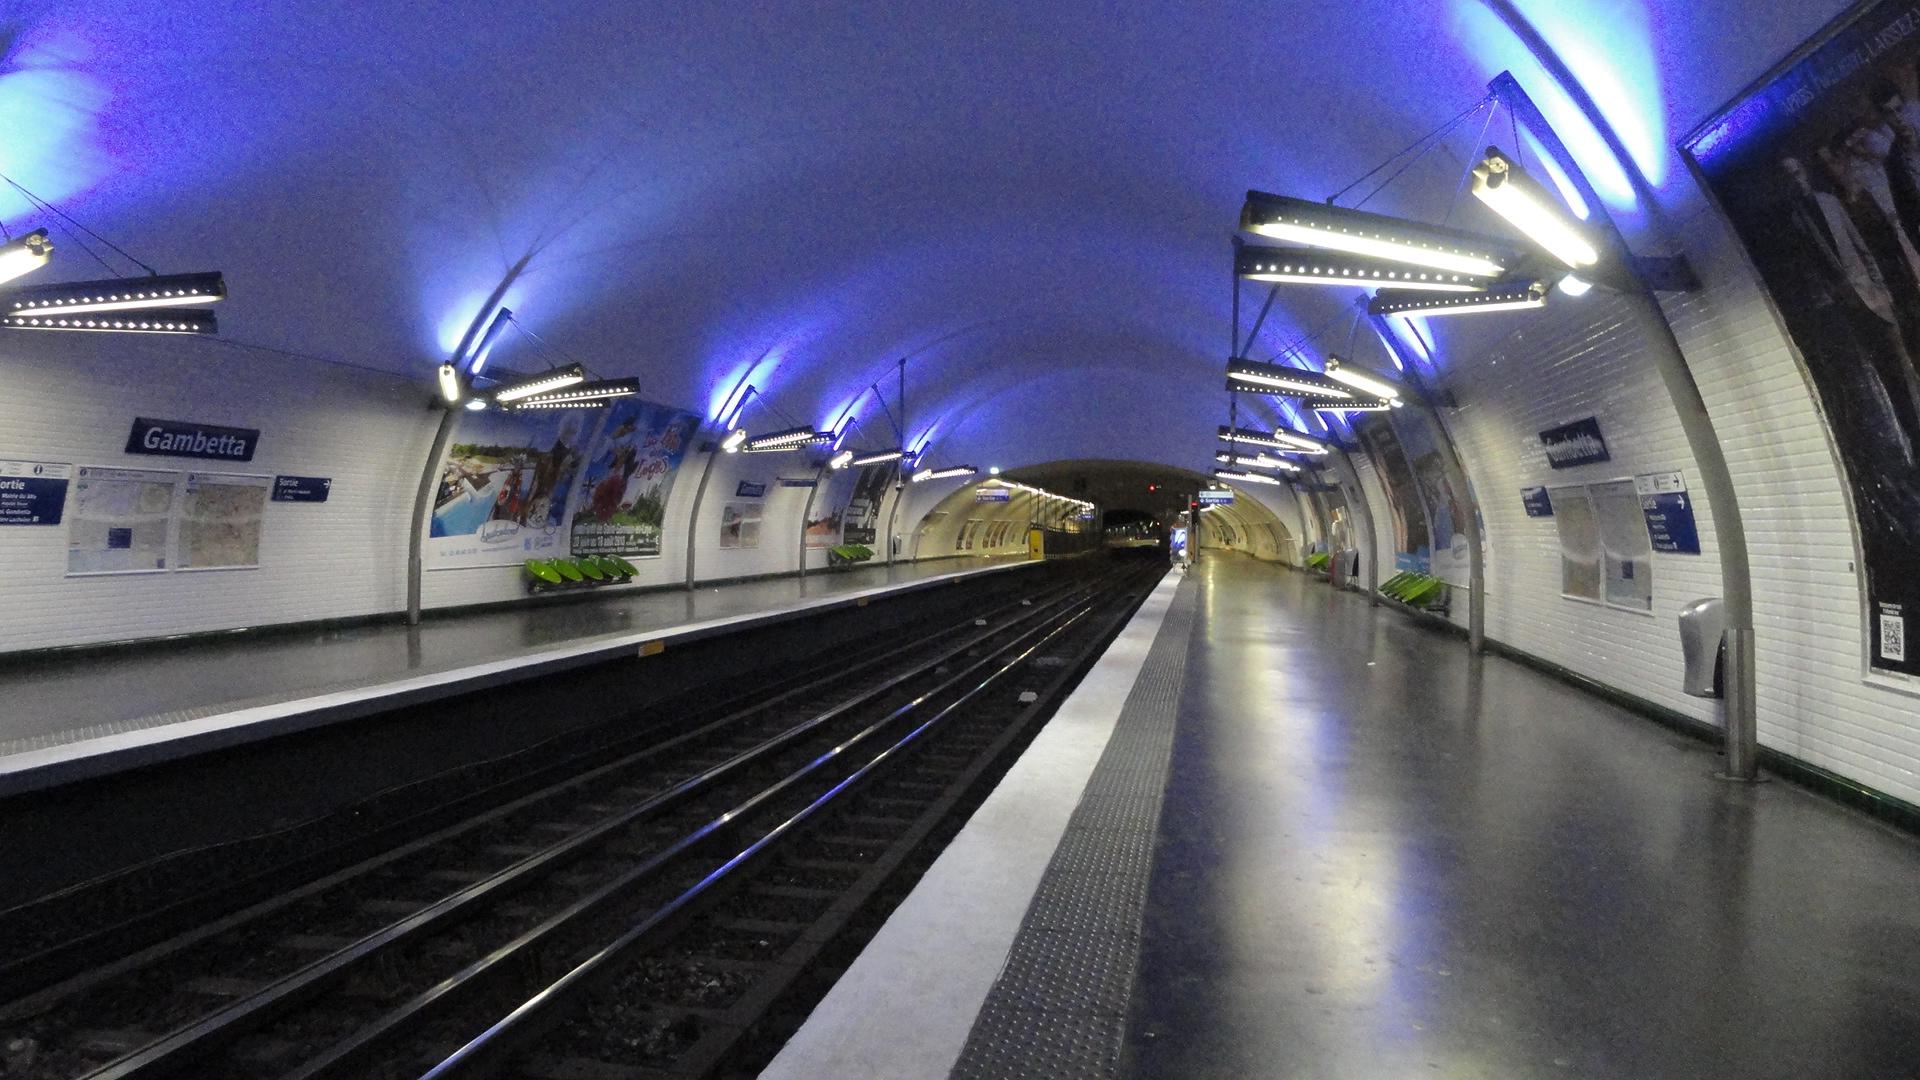 La ligne 3 - Station Gambetta